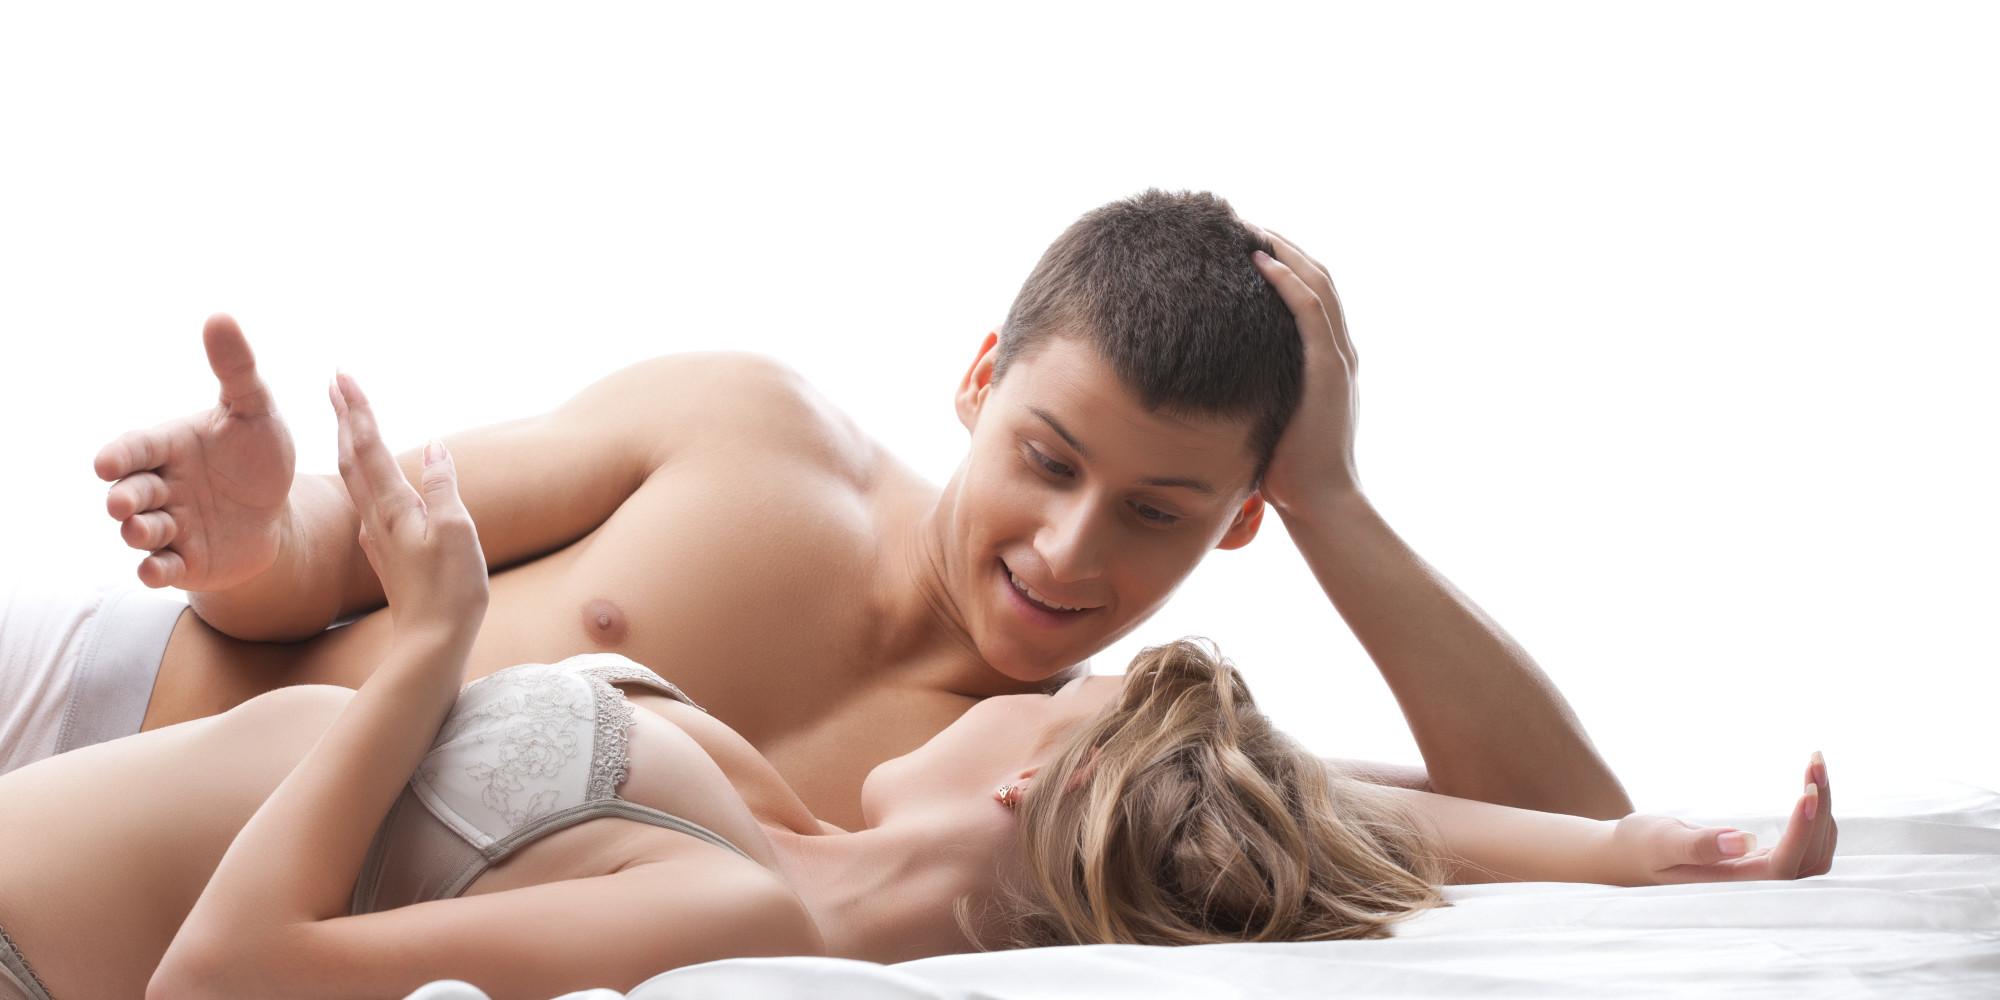 sex contackt porno videos